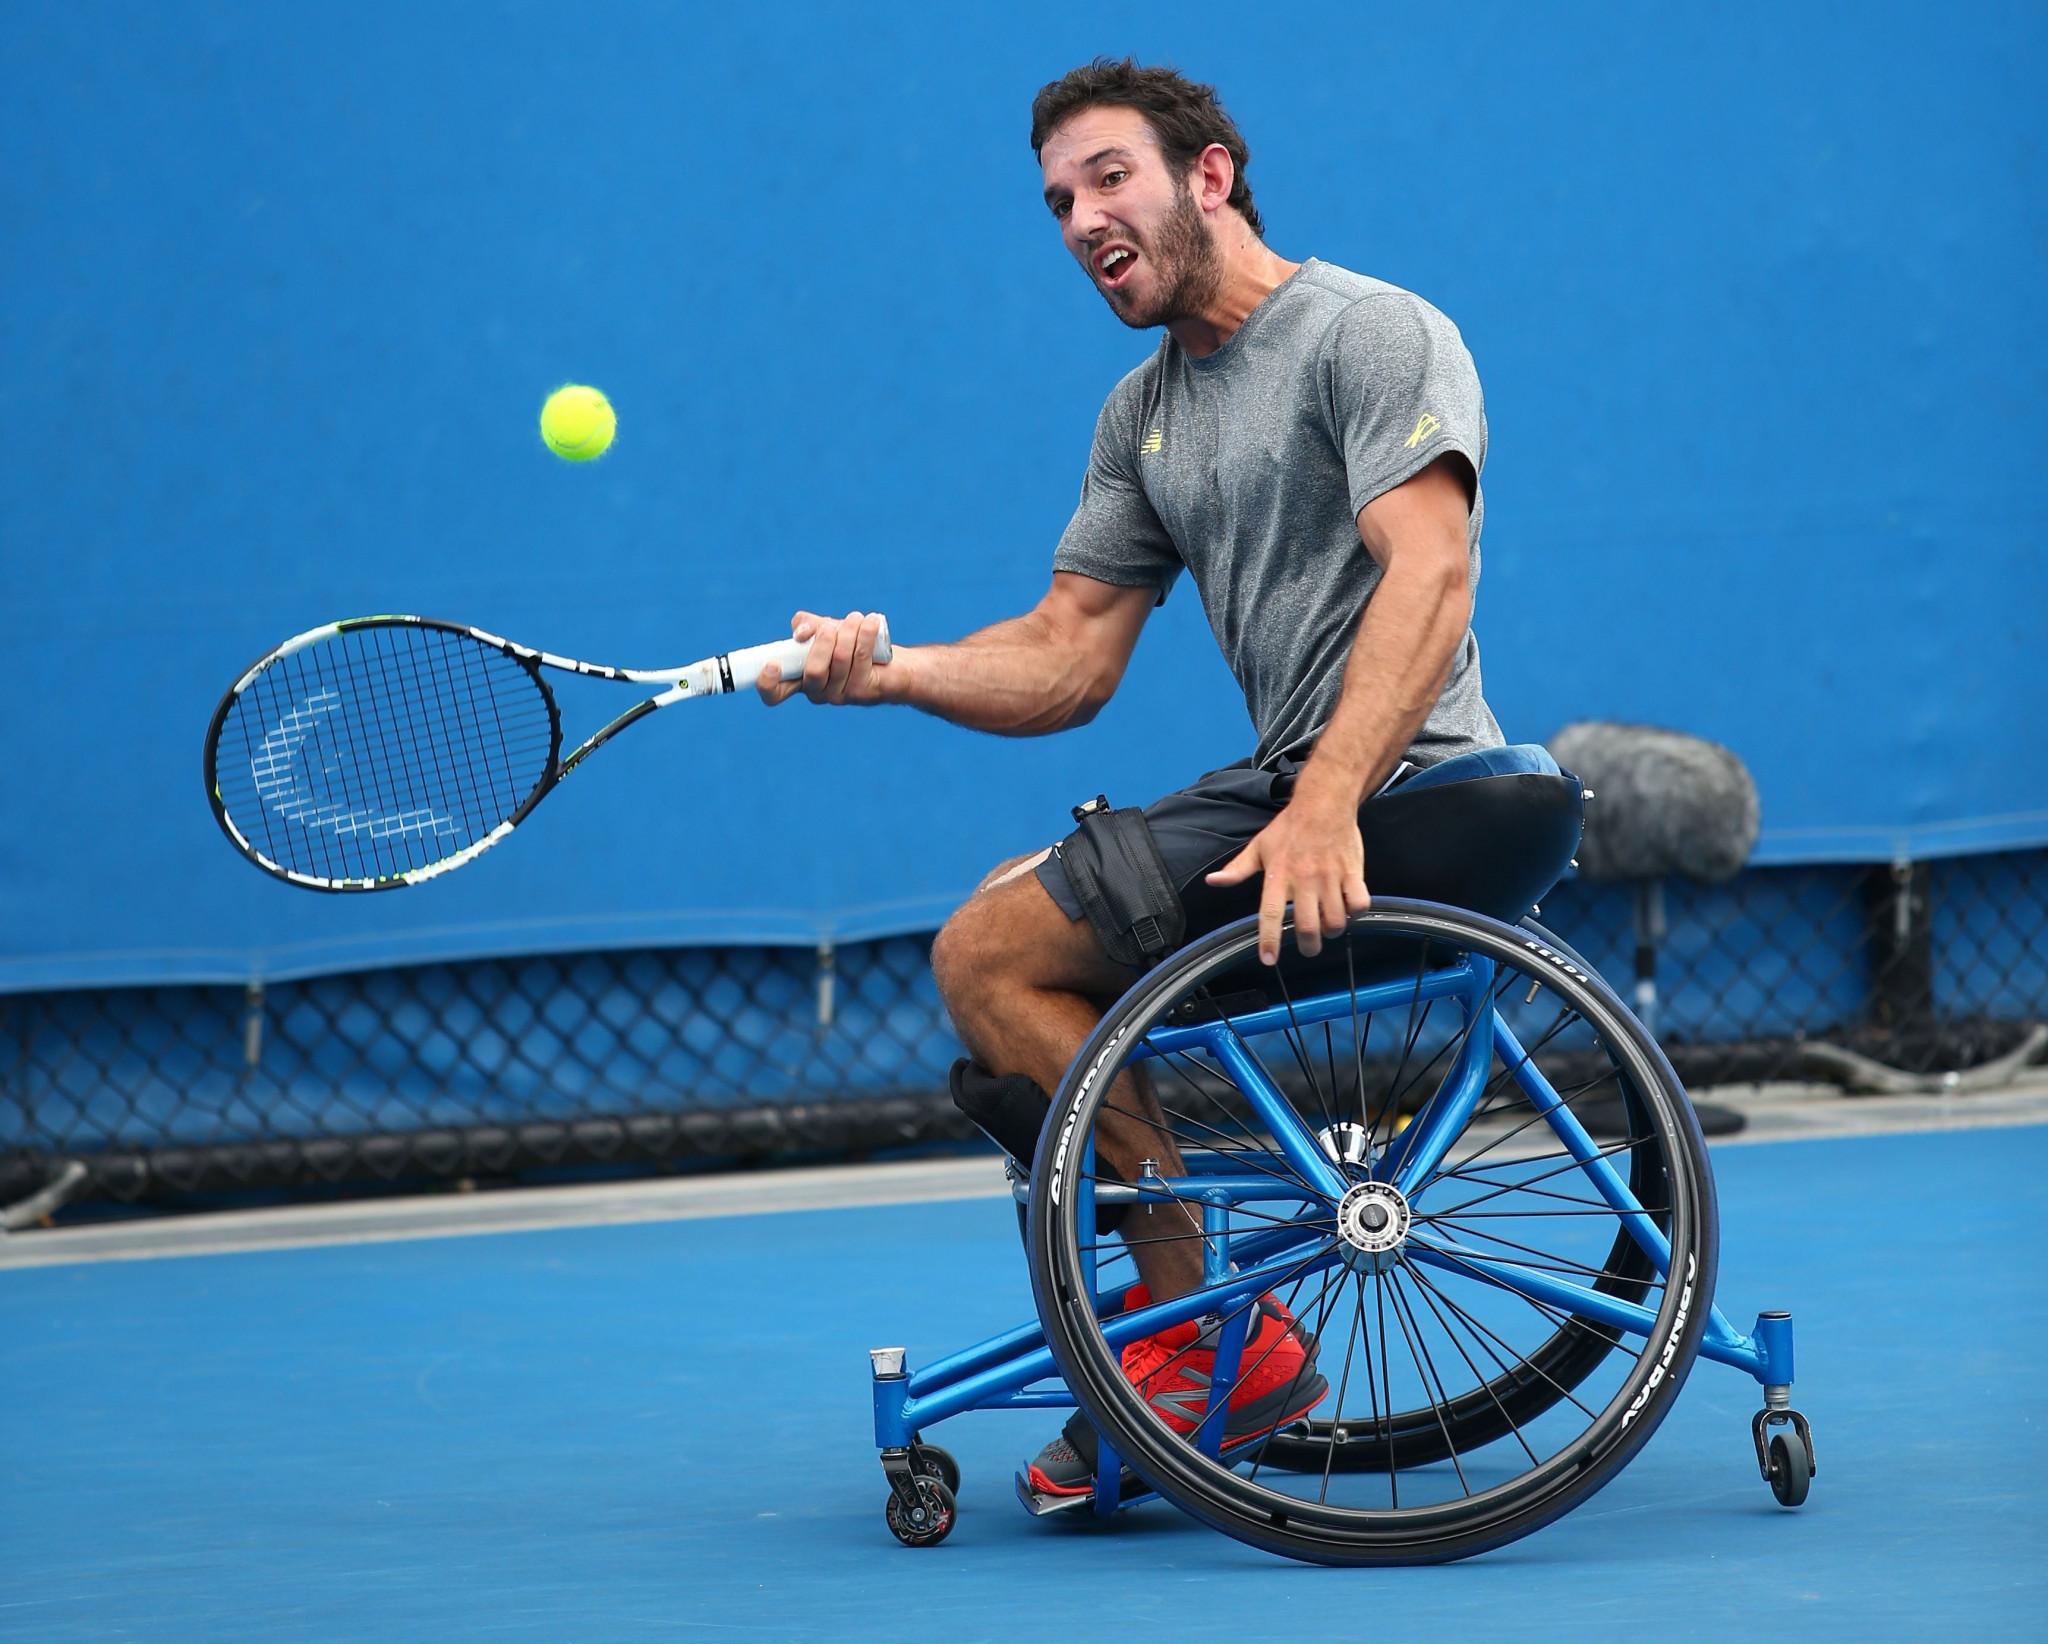 Home favourite Kellerman awarded wildcard as wheelchair entries announced for 2018 Australian Open